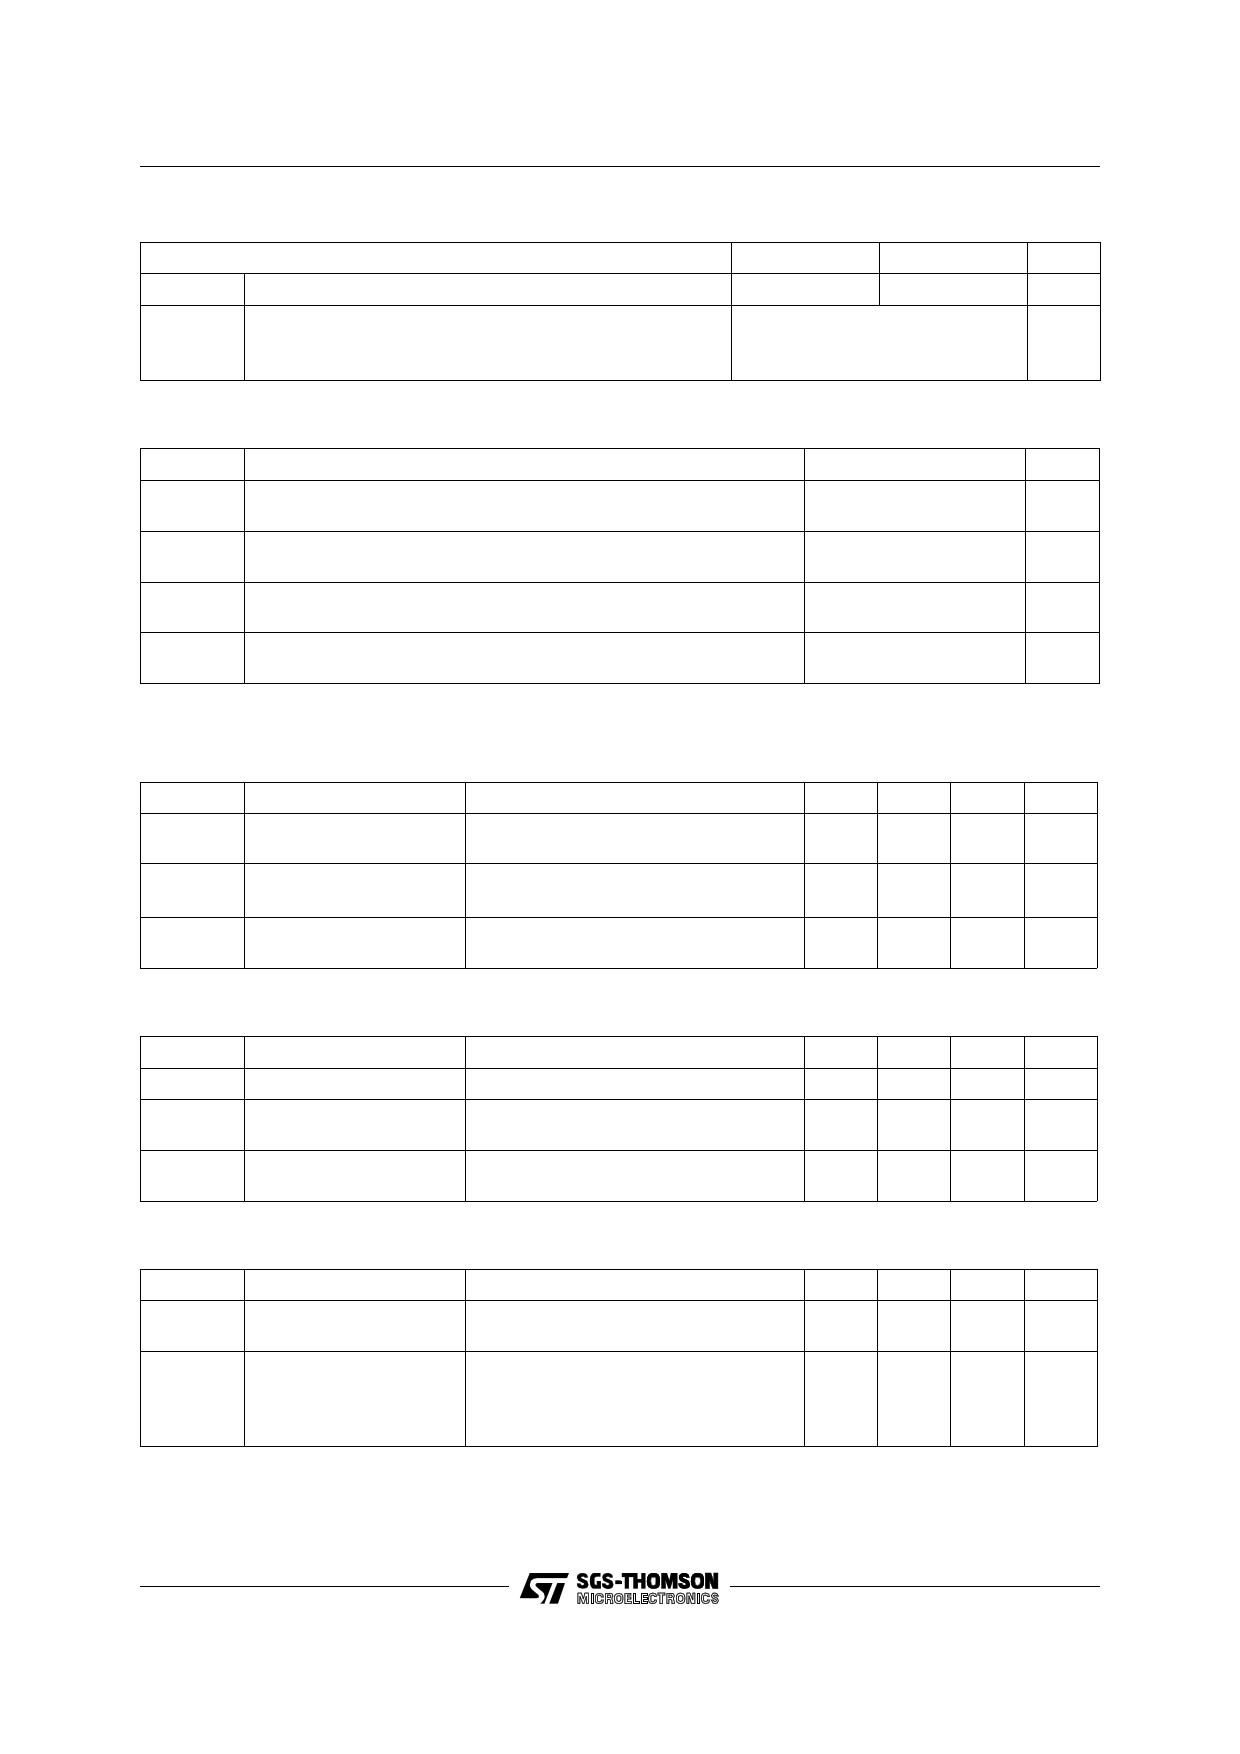 P3NA60 pdf, schematic